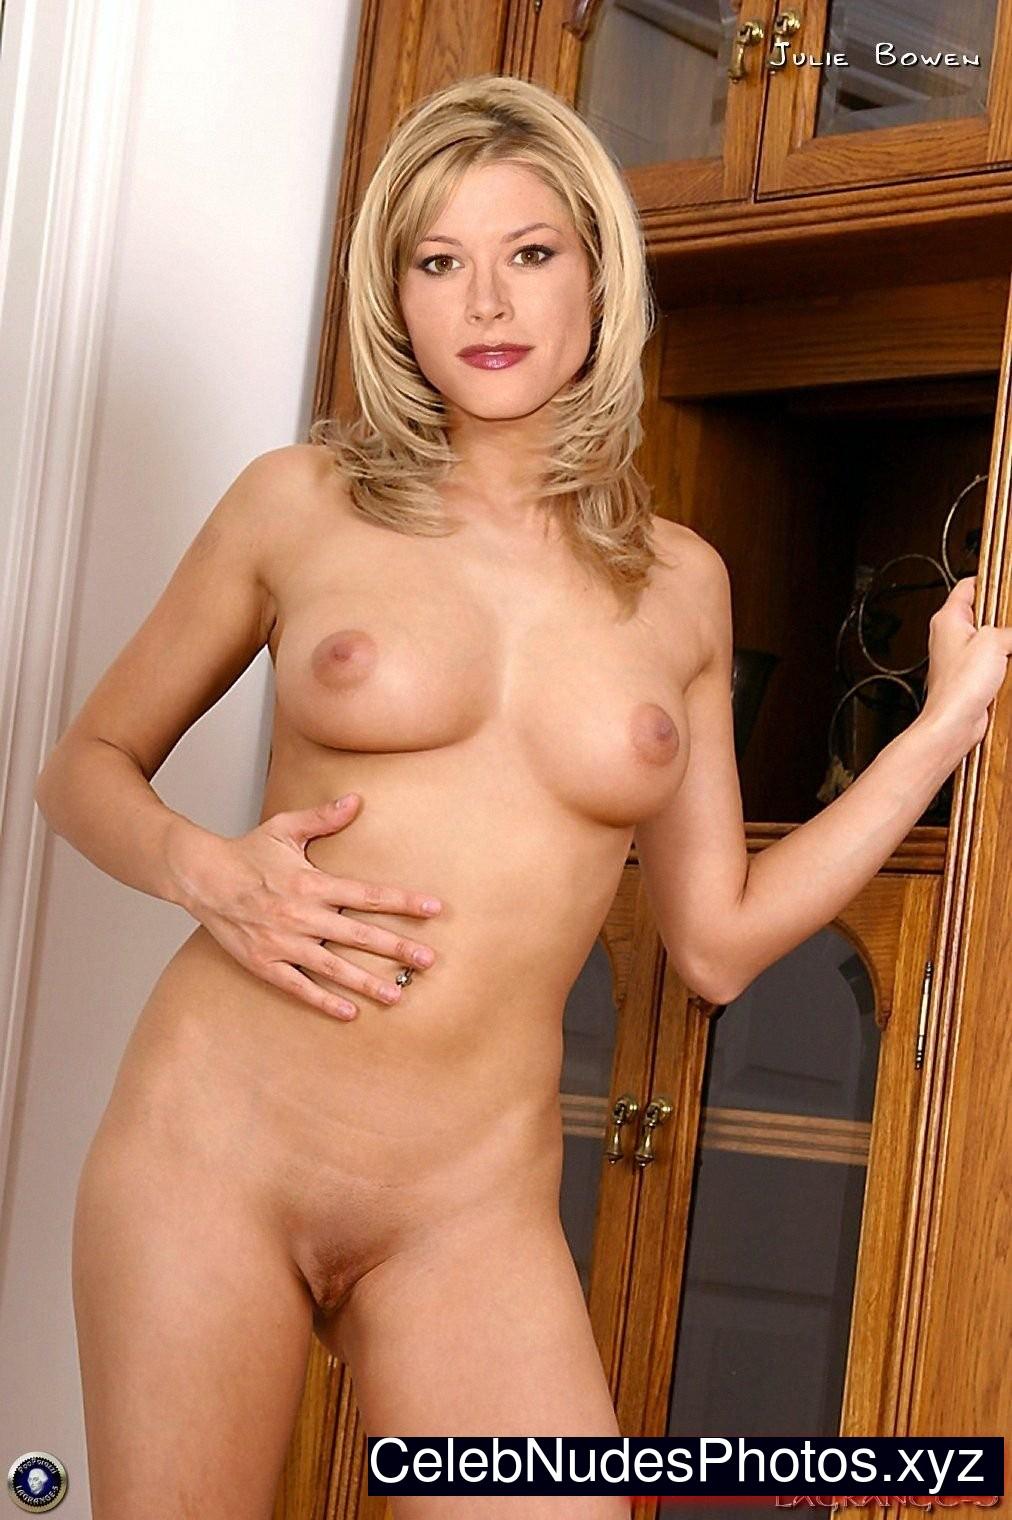 Julie Bowen Newest Celebrity Nude sexy 26